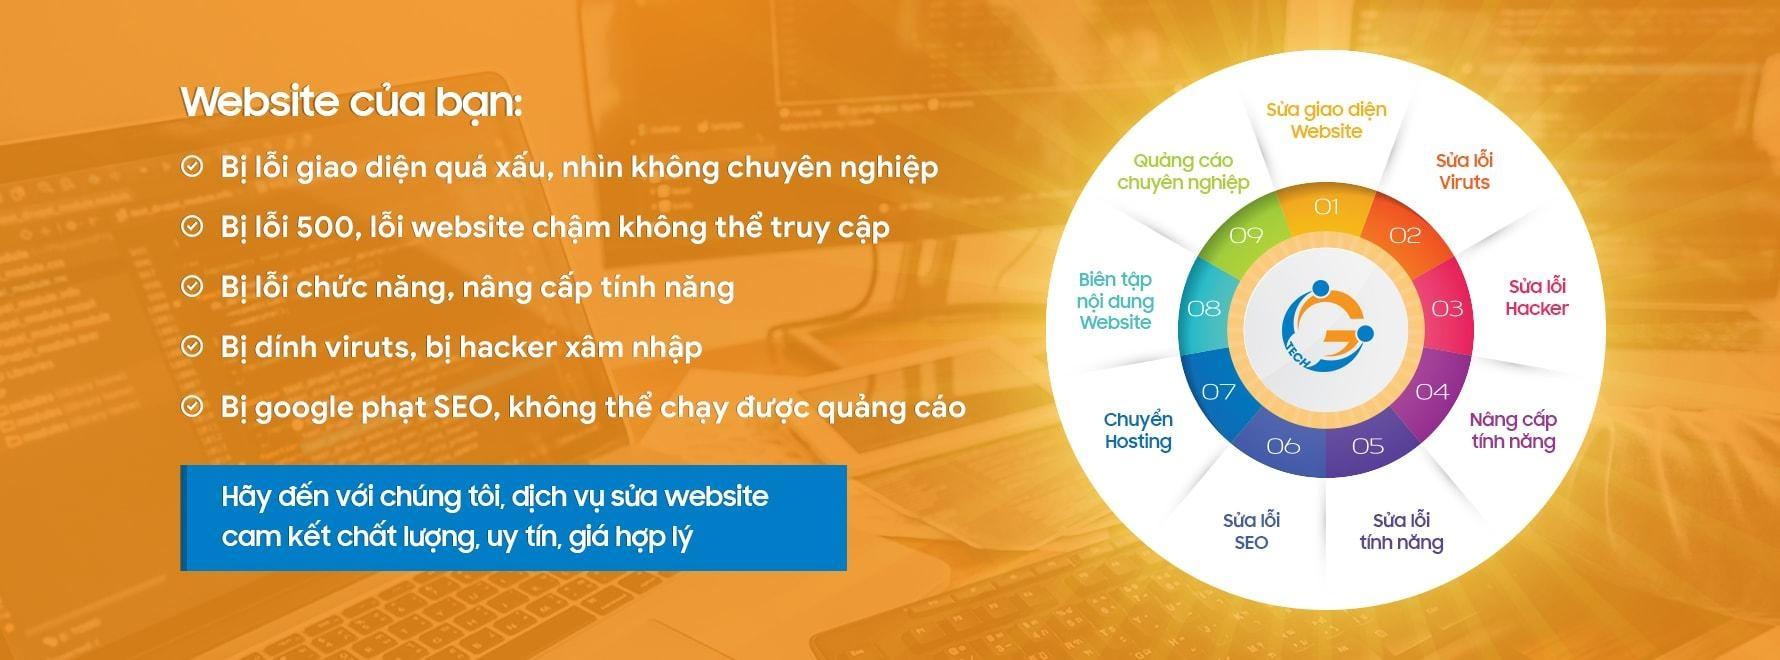 Sửa web - suaweb.vn (@suawebvn) Cover Image